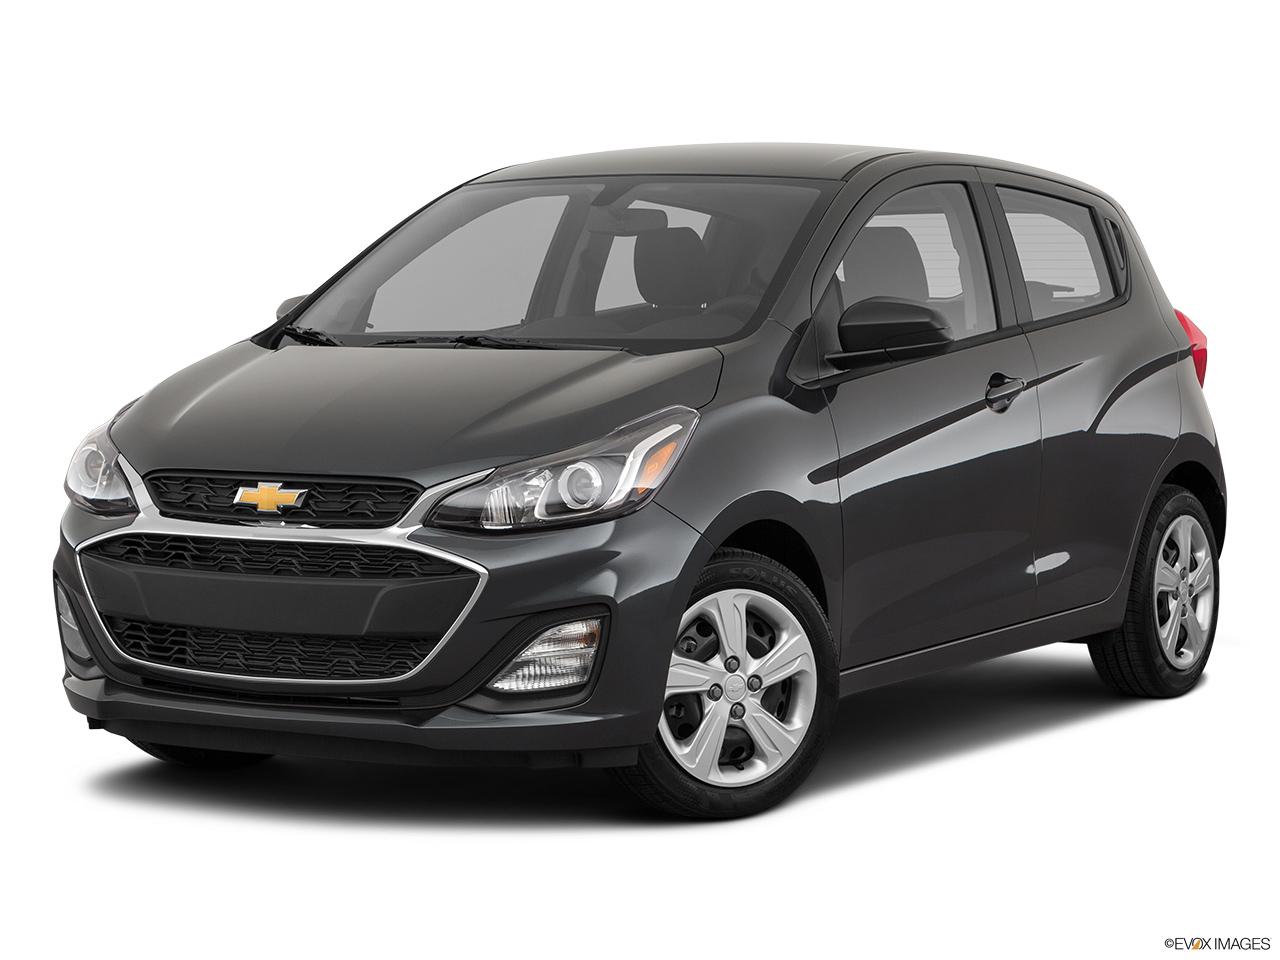 2019 Chevrolet Spark LS Automatic 5Dr FWD hatchback Nightfall Gray Metallic Fuel Efficient Car Canada